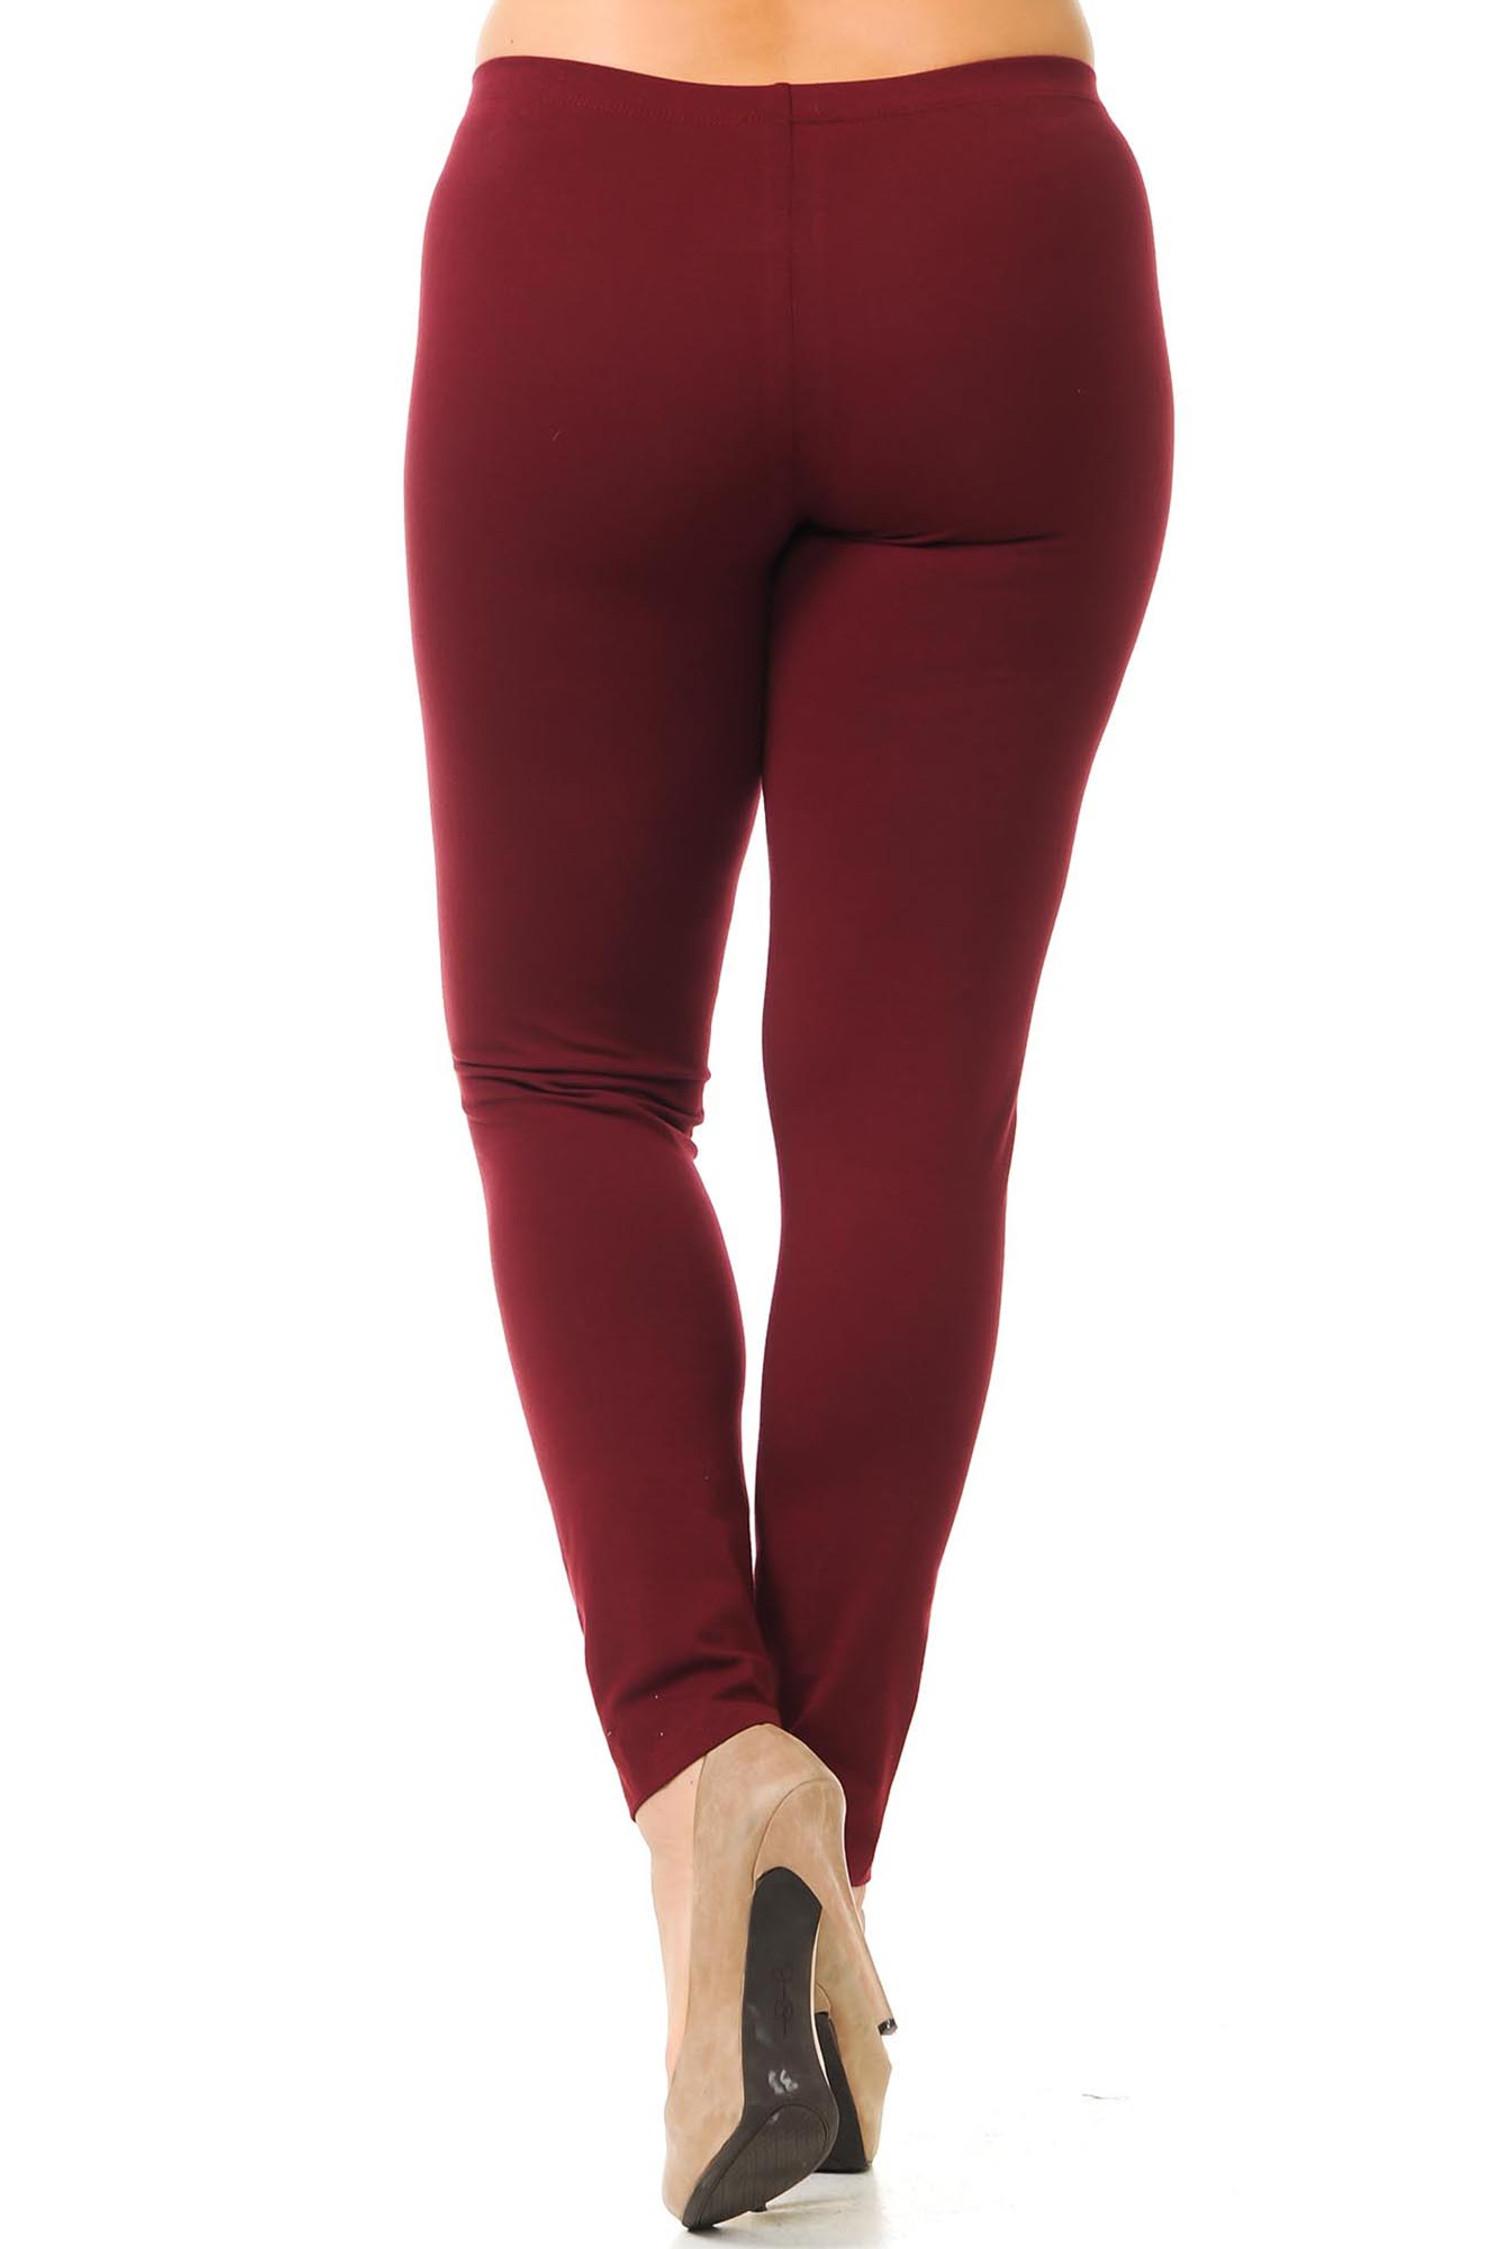 Back view of burgundy USA cotton full length plus size leggings.